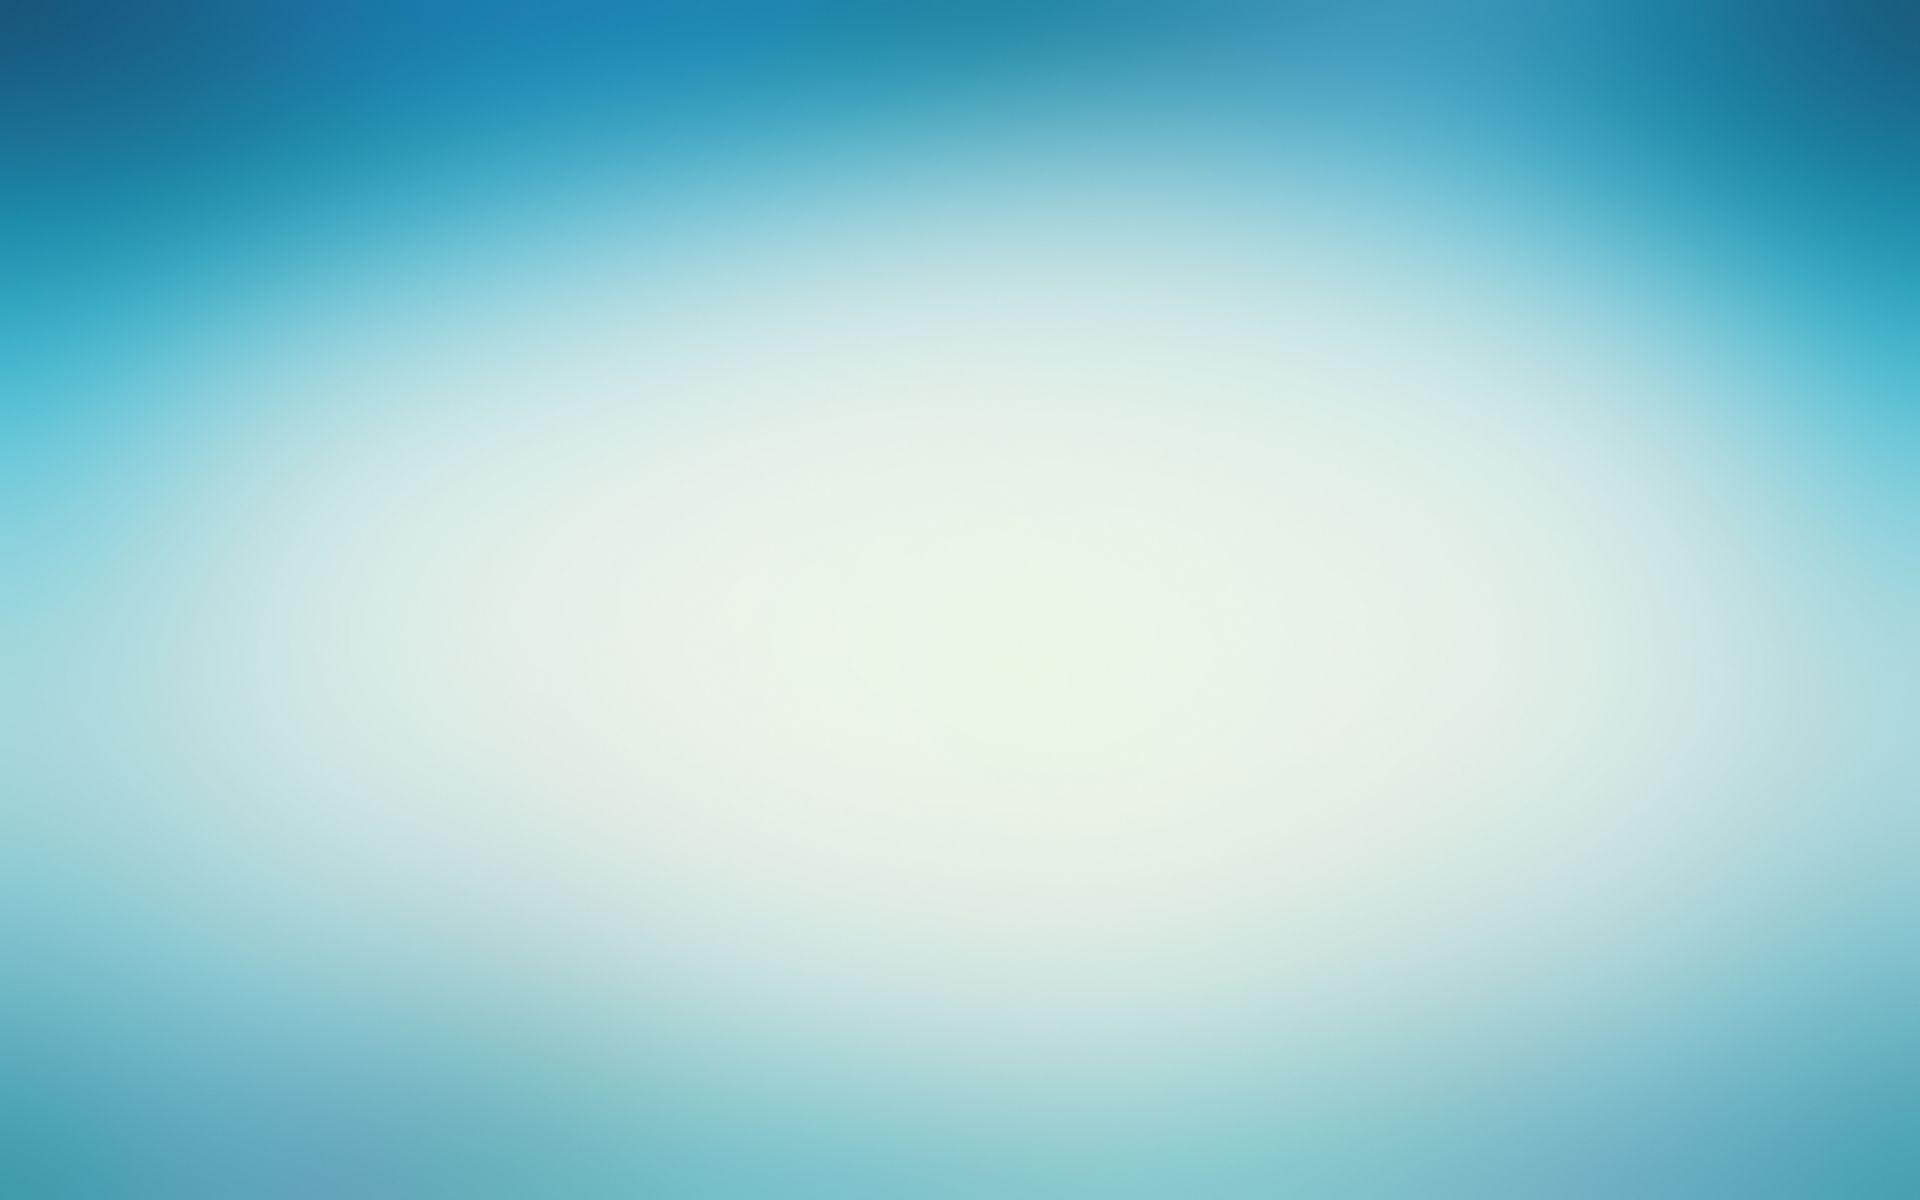 Background Web wallpaper   804834 1920x1200